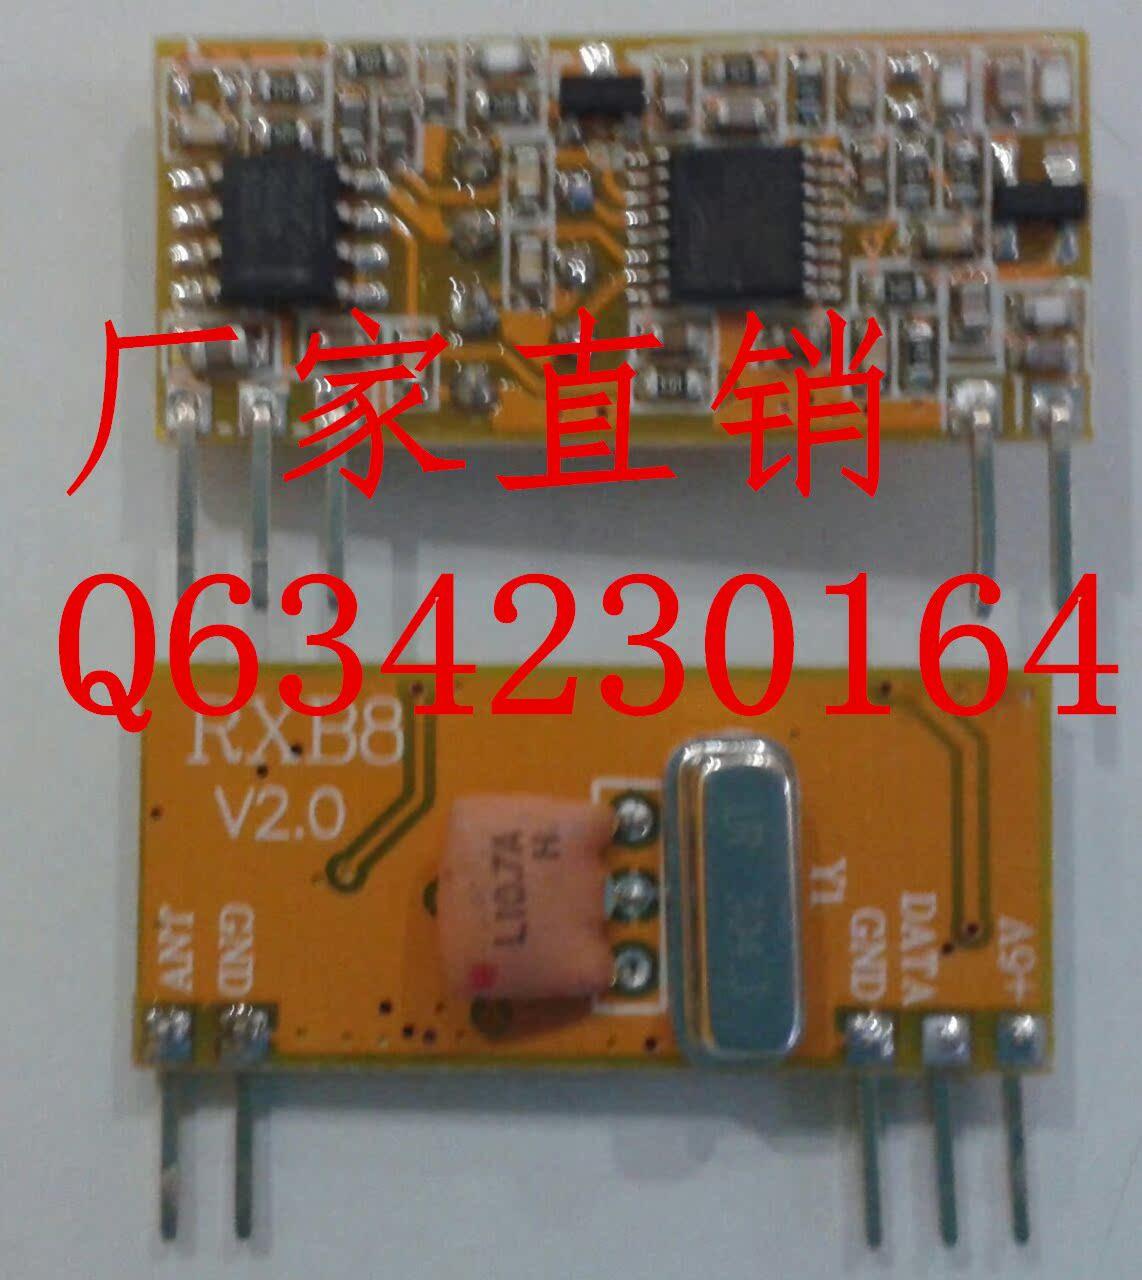 v无线抗干扰无线特强,超高频能力数据传送接收模块RXB8418MHZ